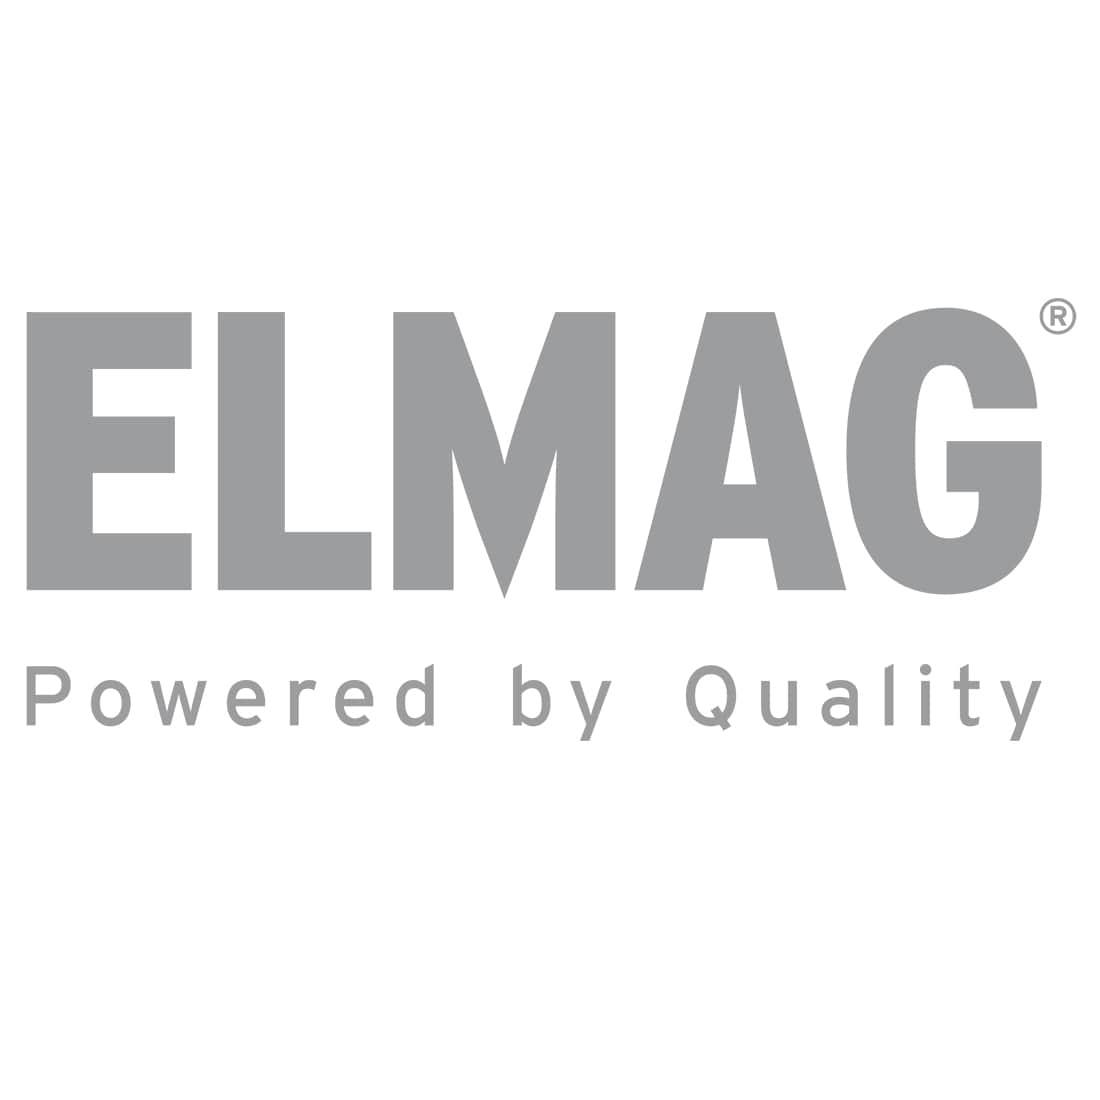 Multifunction welding inverter, mobile - STEEL-ALUMINUM SET